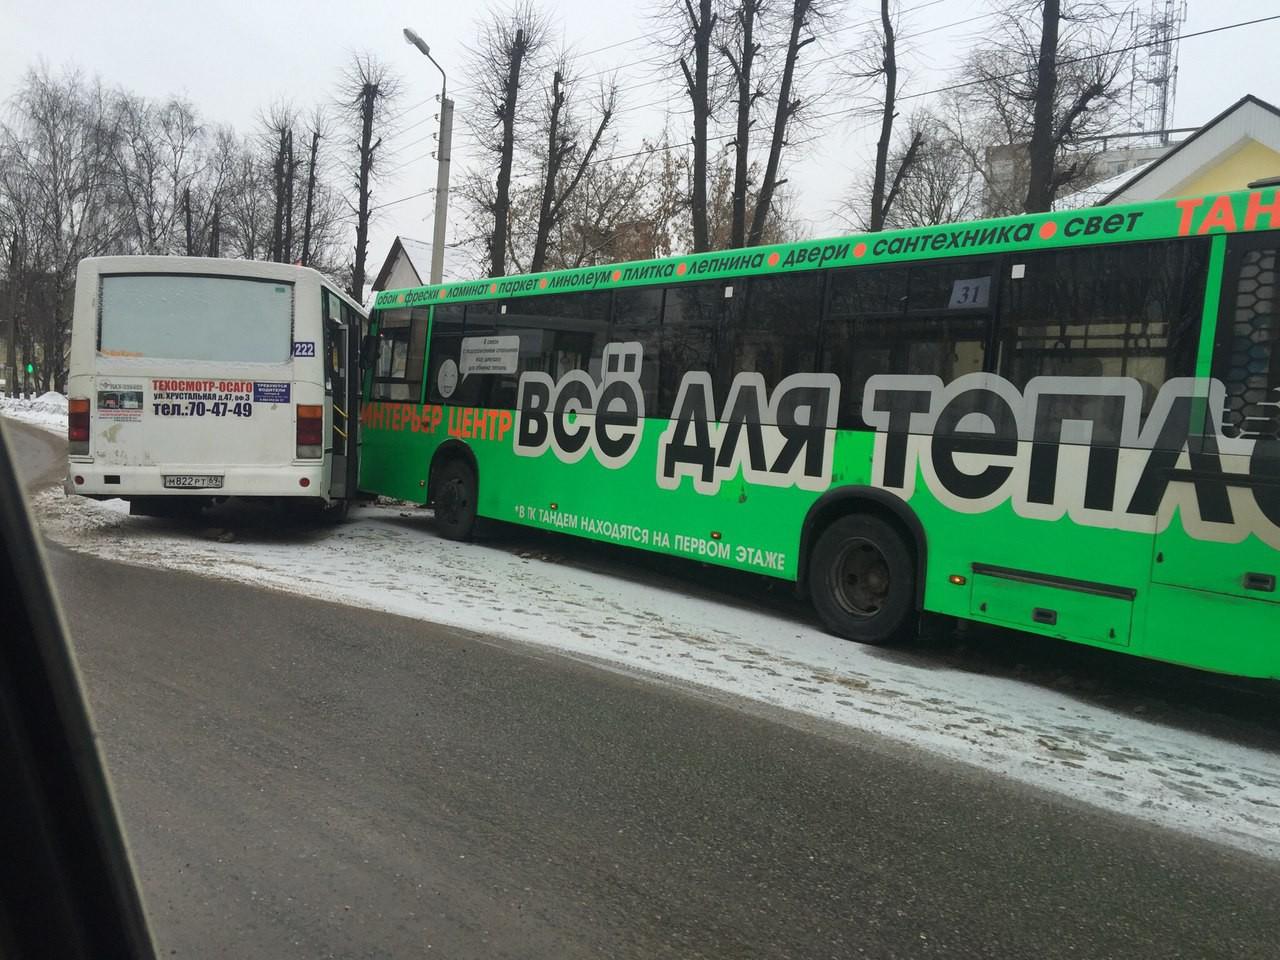 ВТвери маршрутка столкнулась савтобусом, пострадал пенсионерка